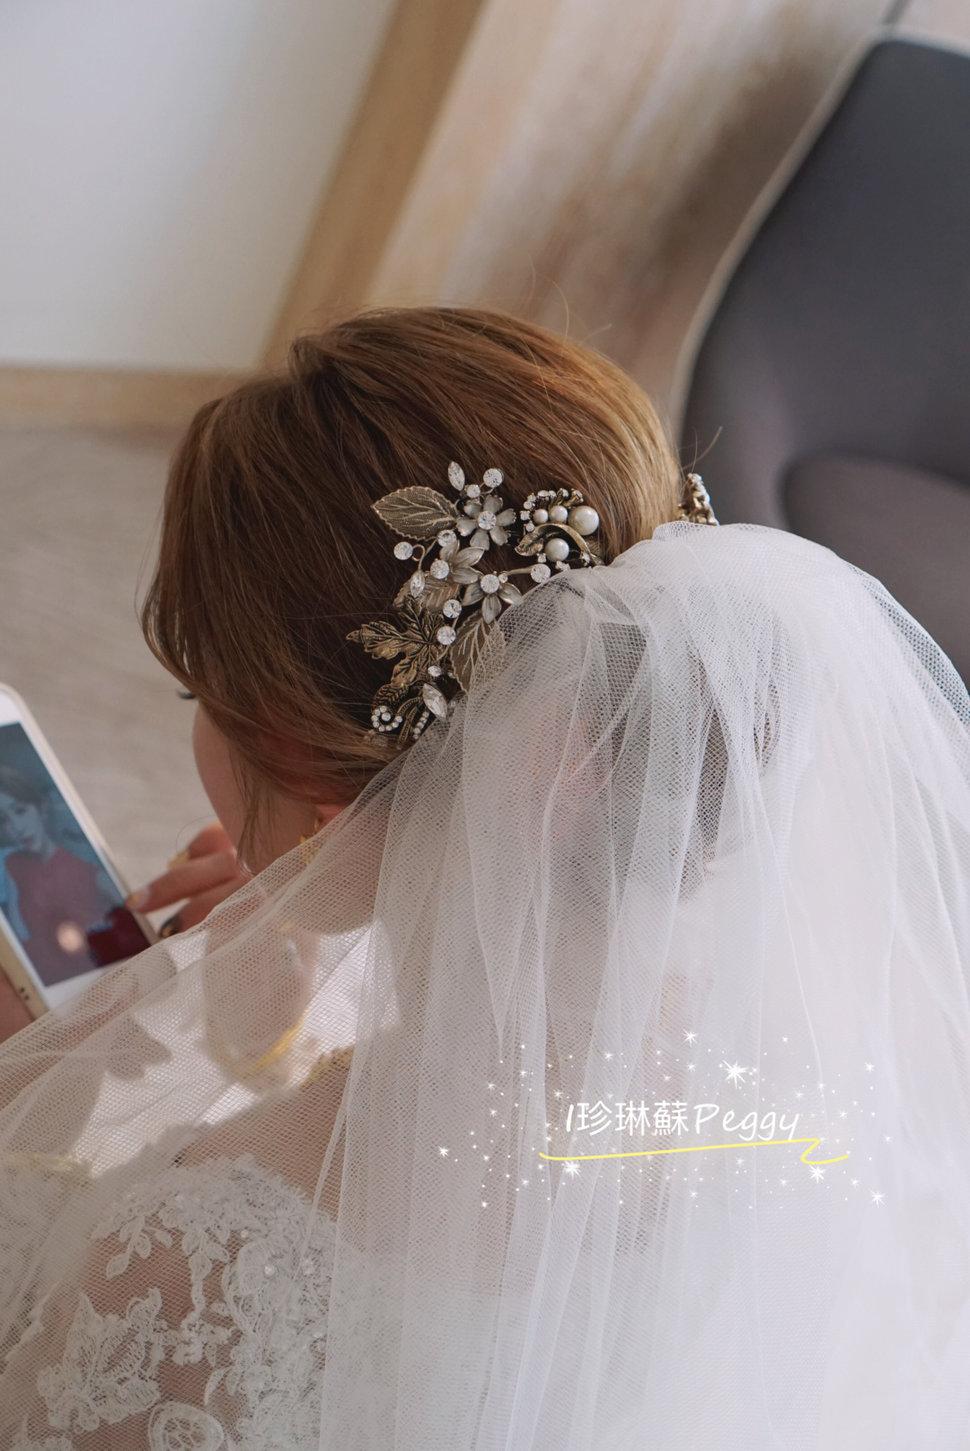 9276BDDF-01B7-4CA4-808B-60B521418A70 - 珍琳蘇peggy《結婚吧》